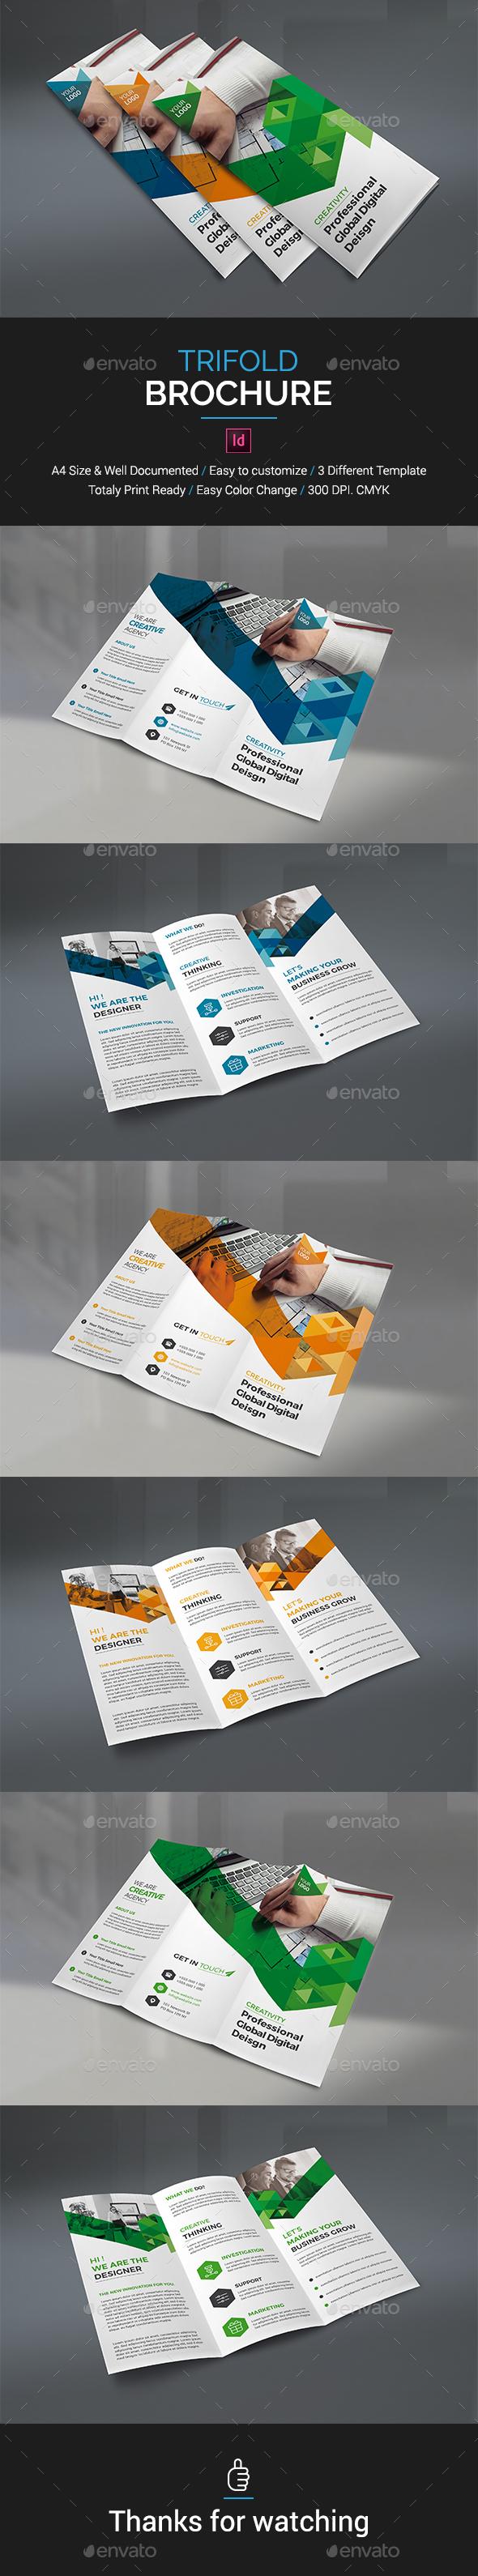 trifold brochure template indesign indd brochure templates pinterest